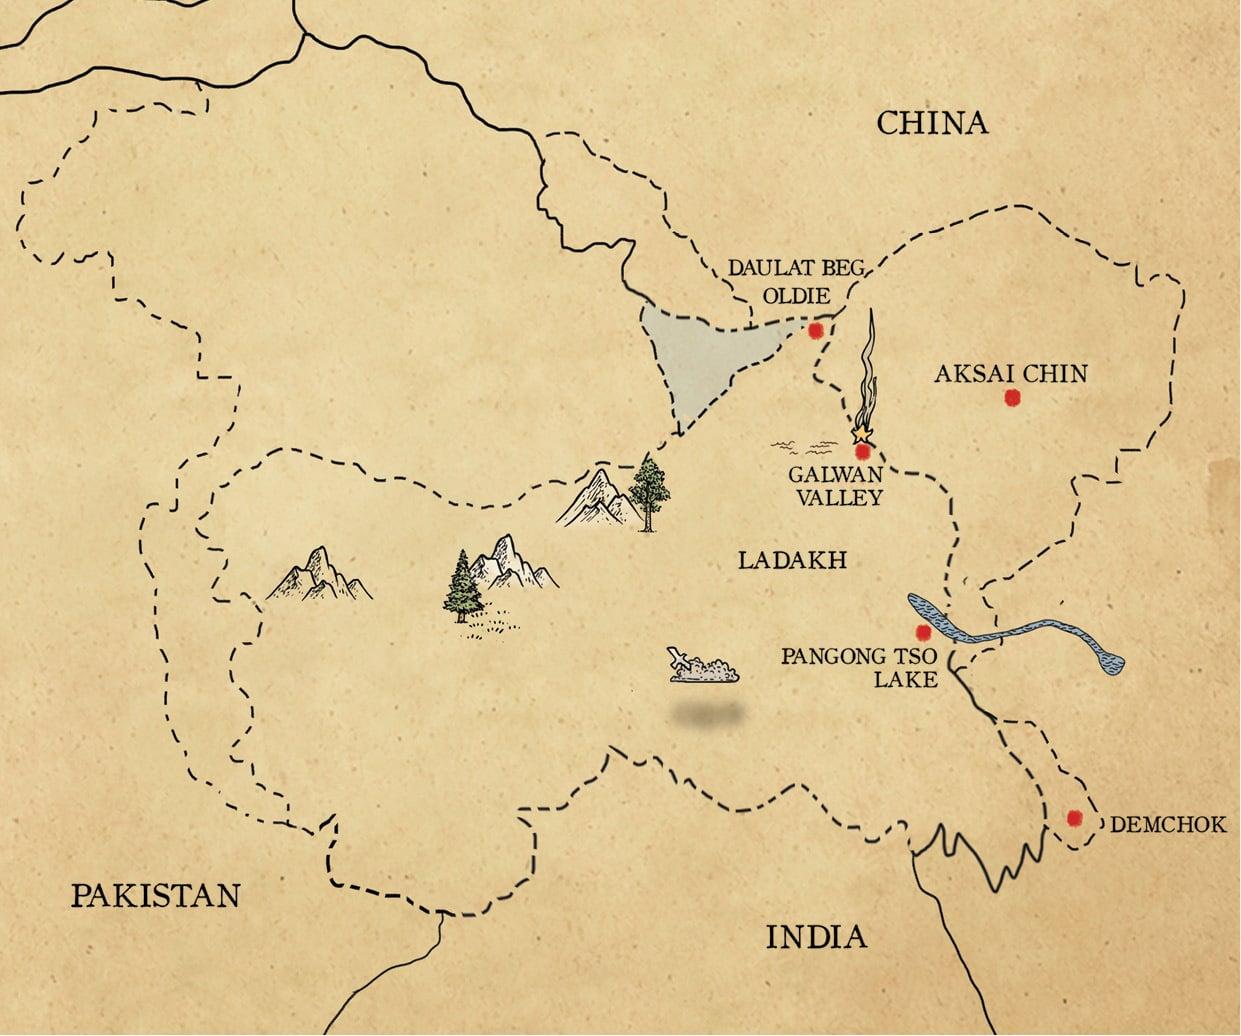 Map design by Samiah Bilal